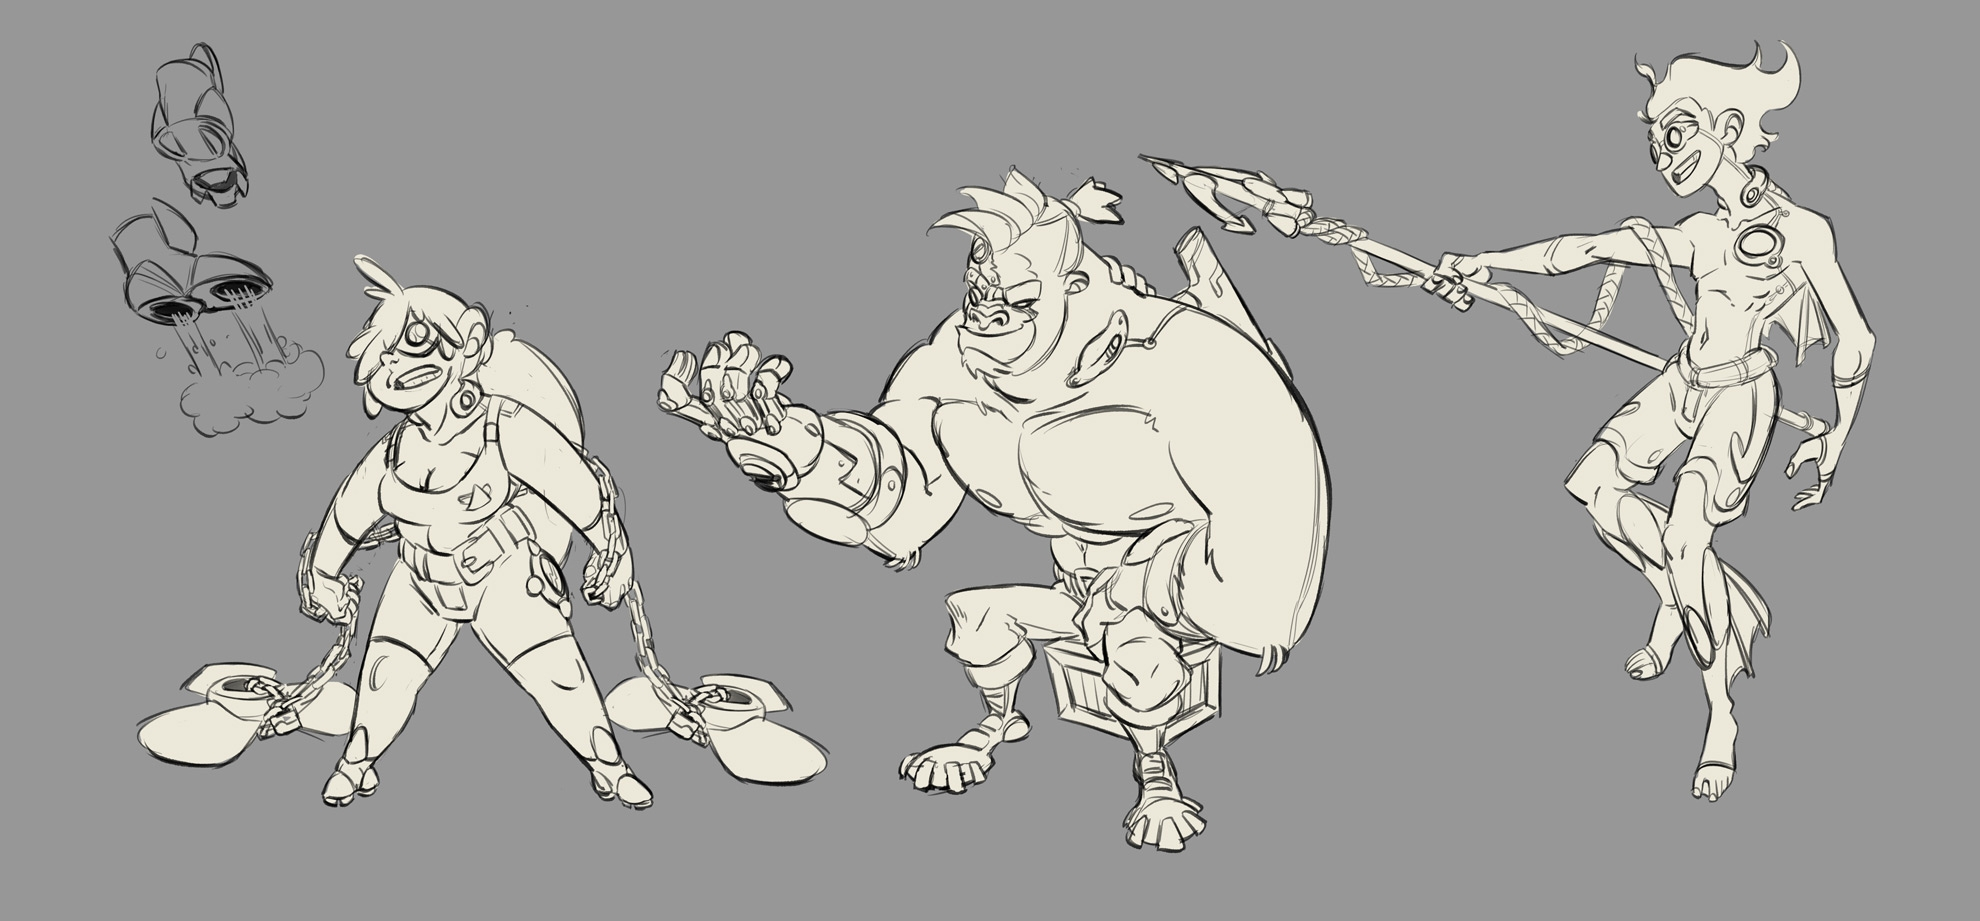 Character Sketches - characterdesign - emanuelearnaldi | ello